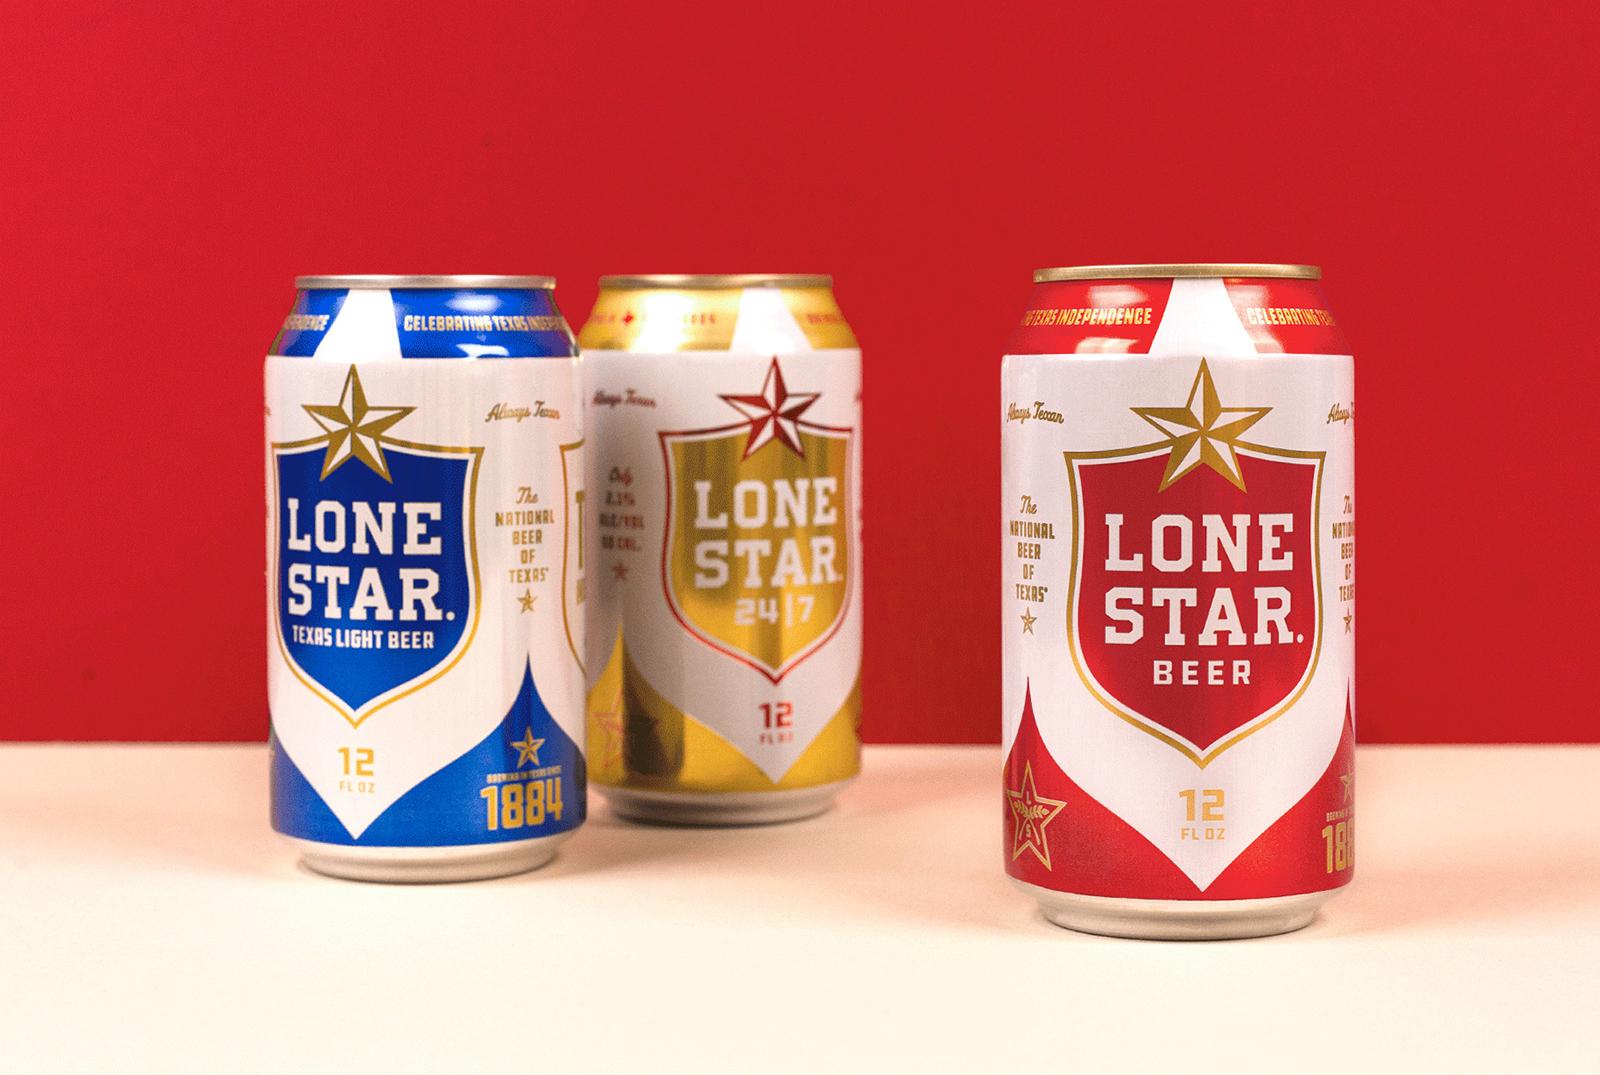 Lone Star孤星啤酒品牌更新全新的品牌VI视觉和包装设计-深圳VI设计13